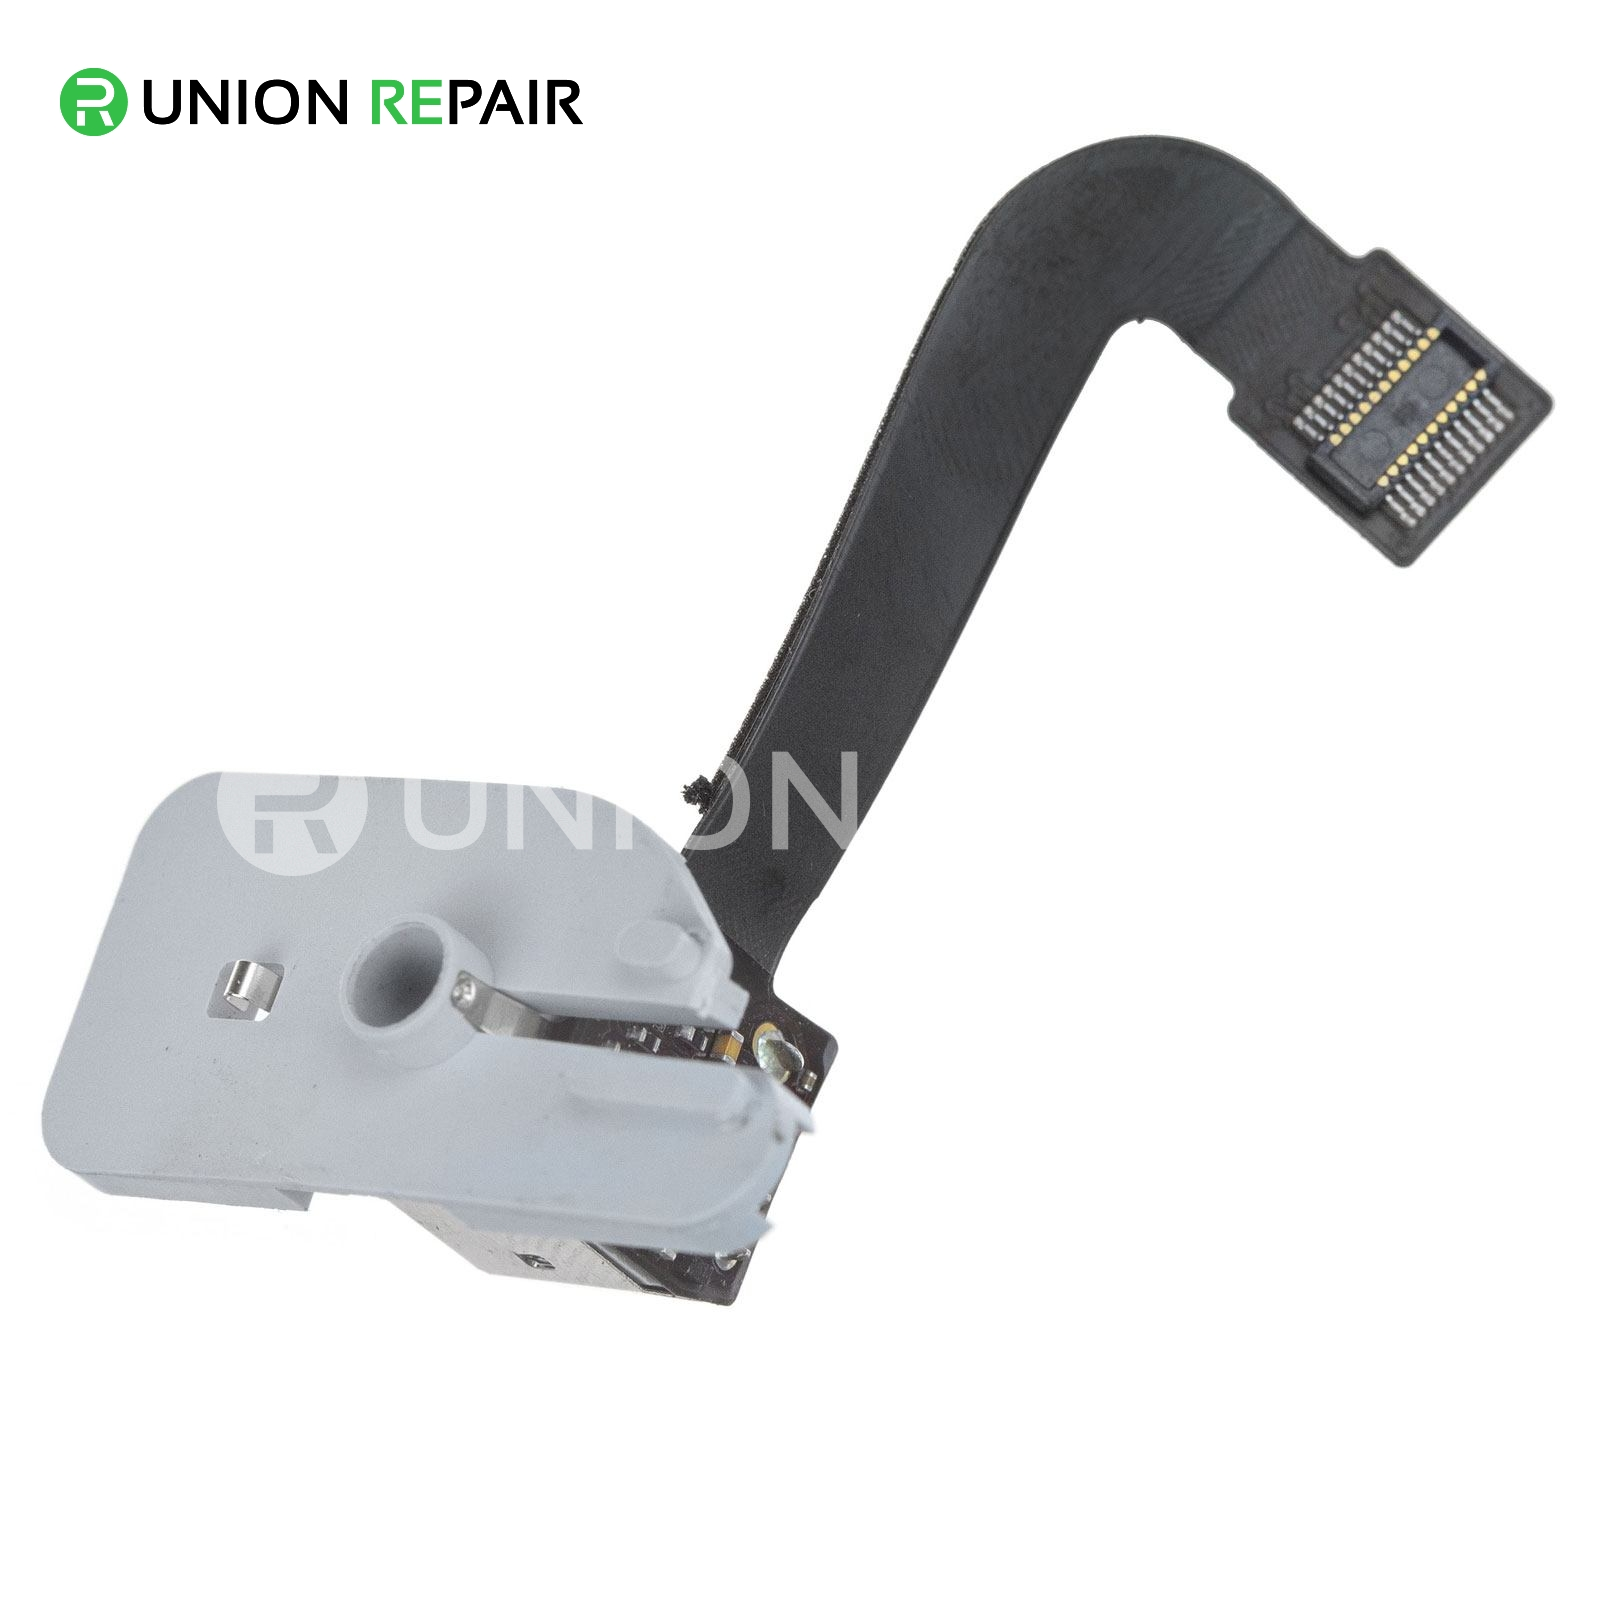 Headphone Jack Flex Cable For Imac 21 5 U0026quot  A1418  Late 2013